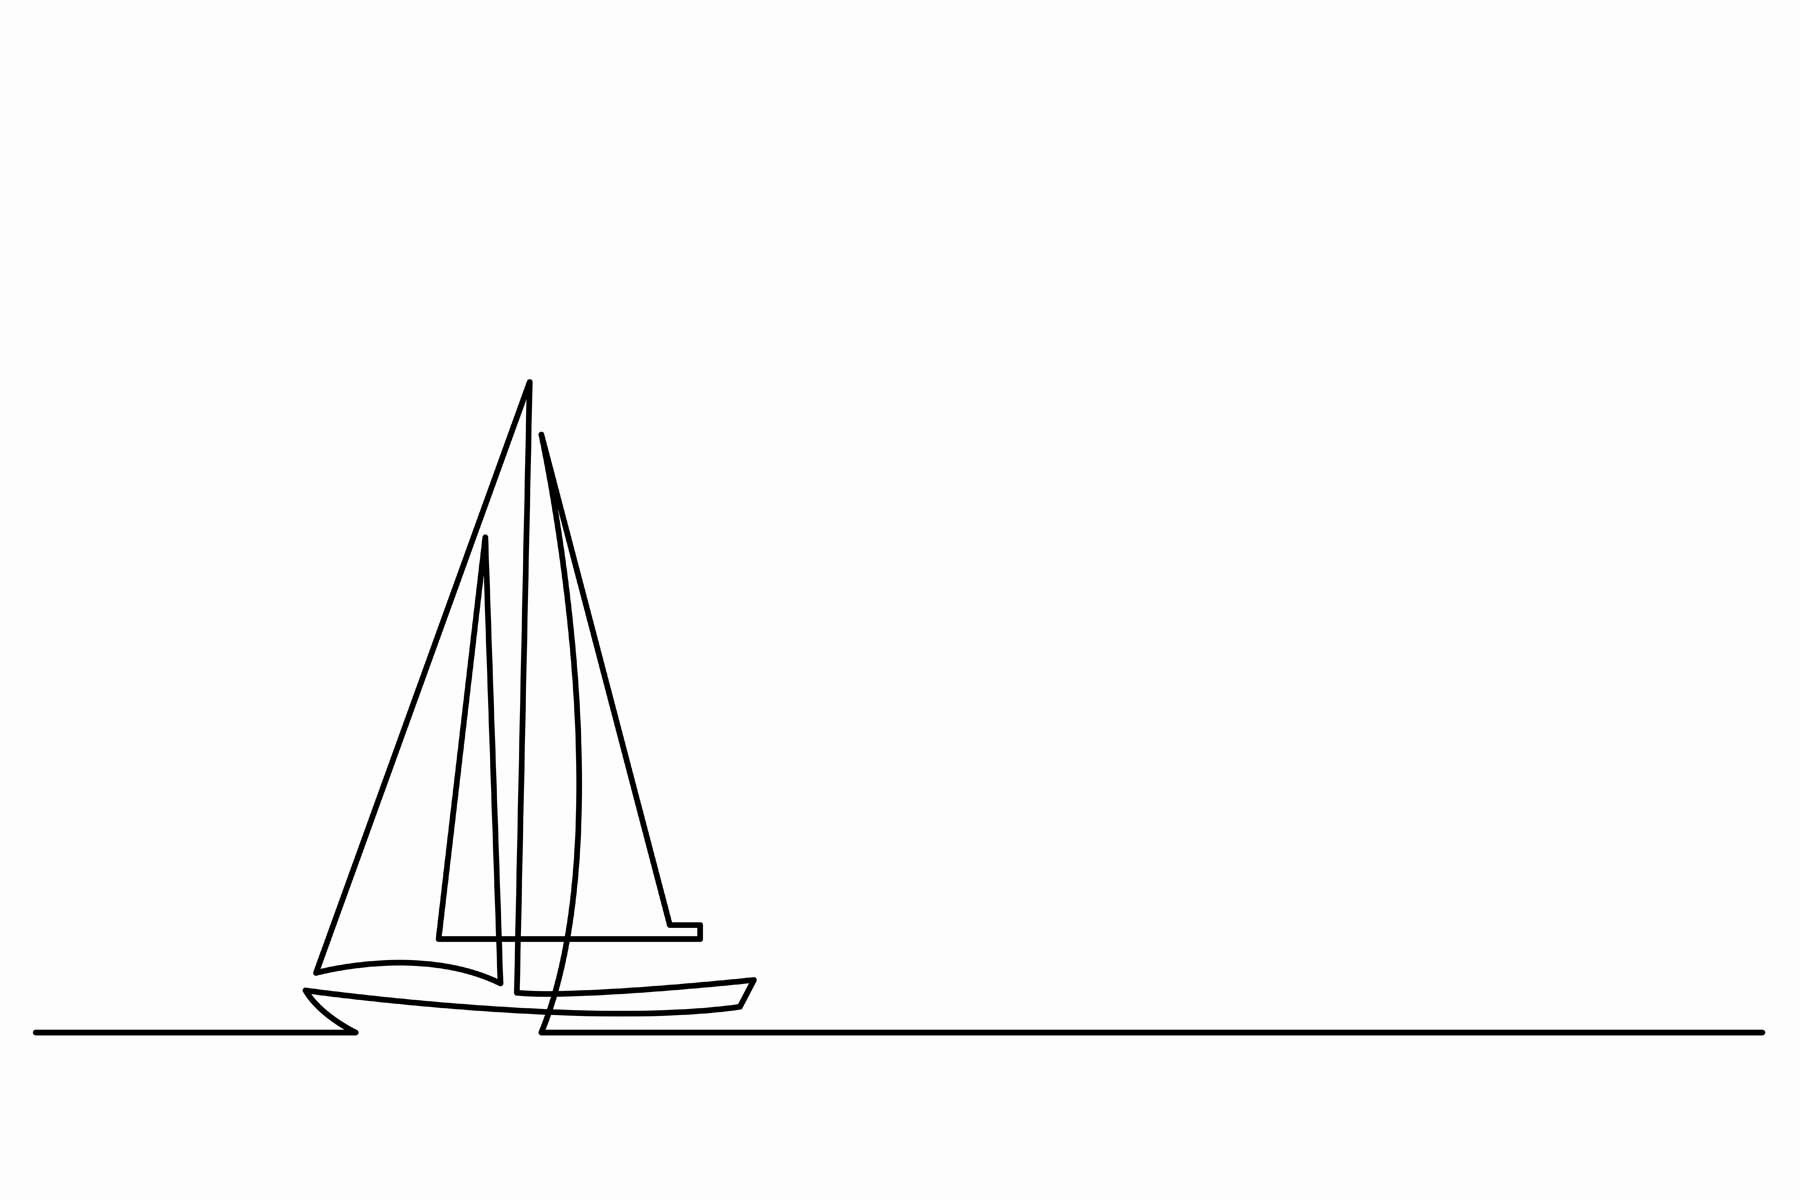 PlateART Wandverkleidung mit Motiv Segelboot